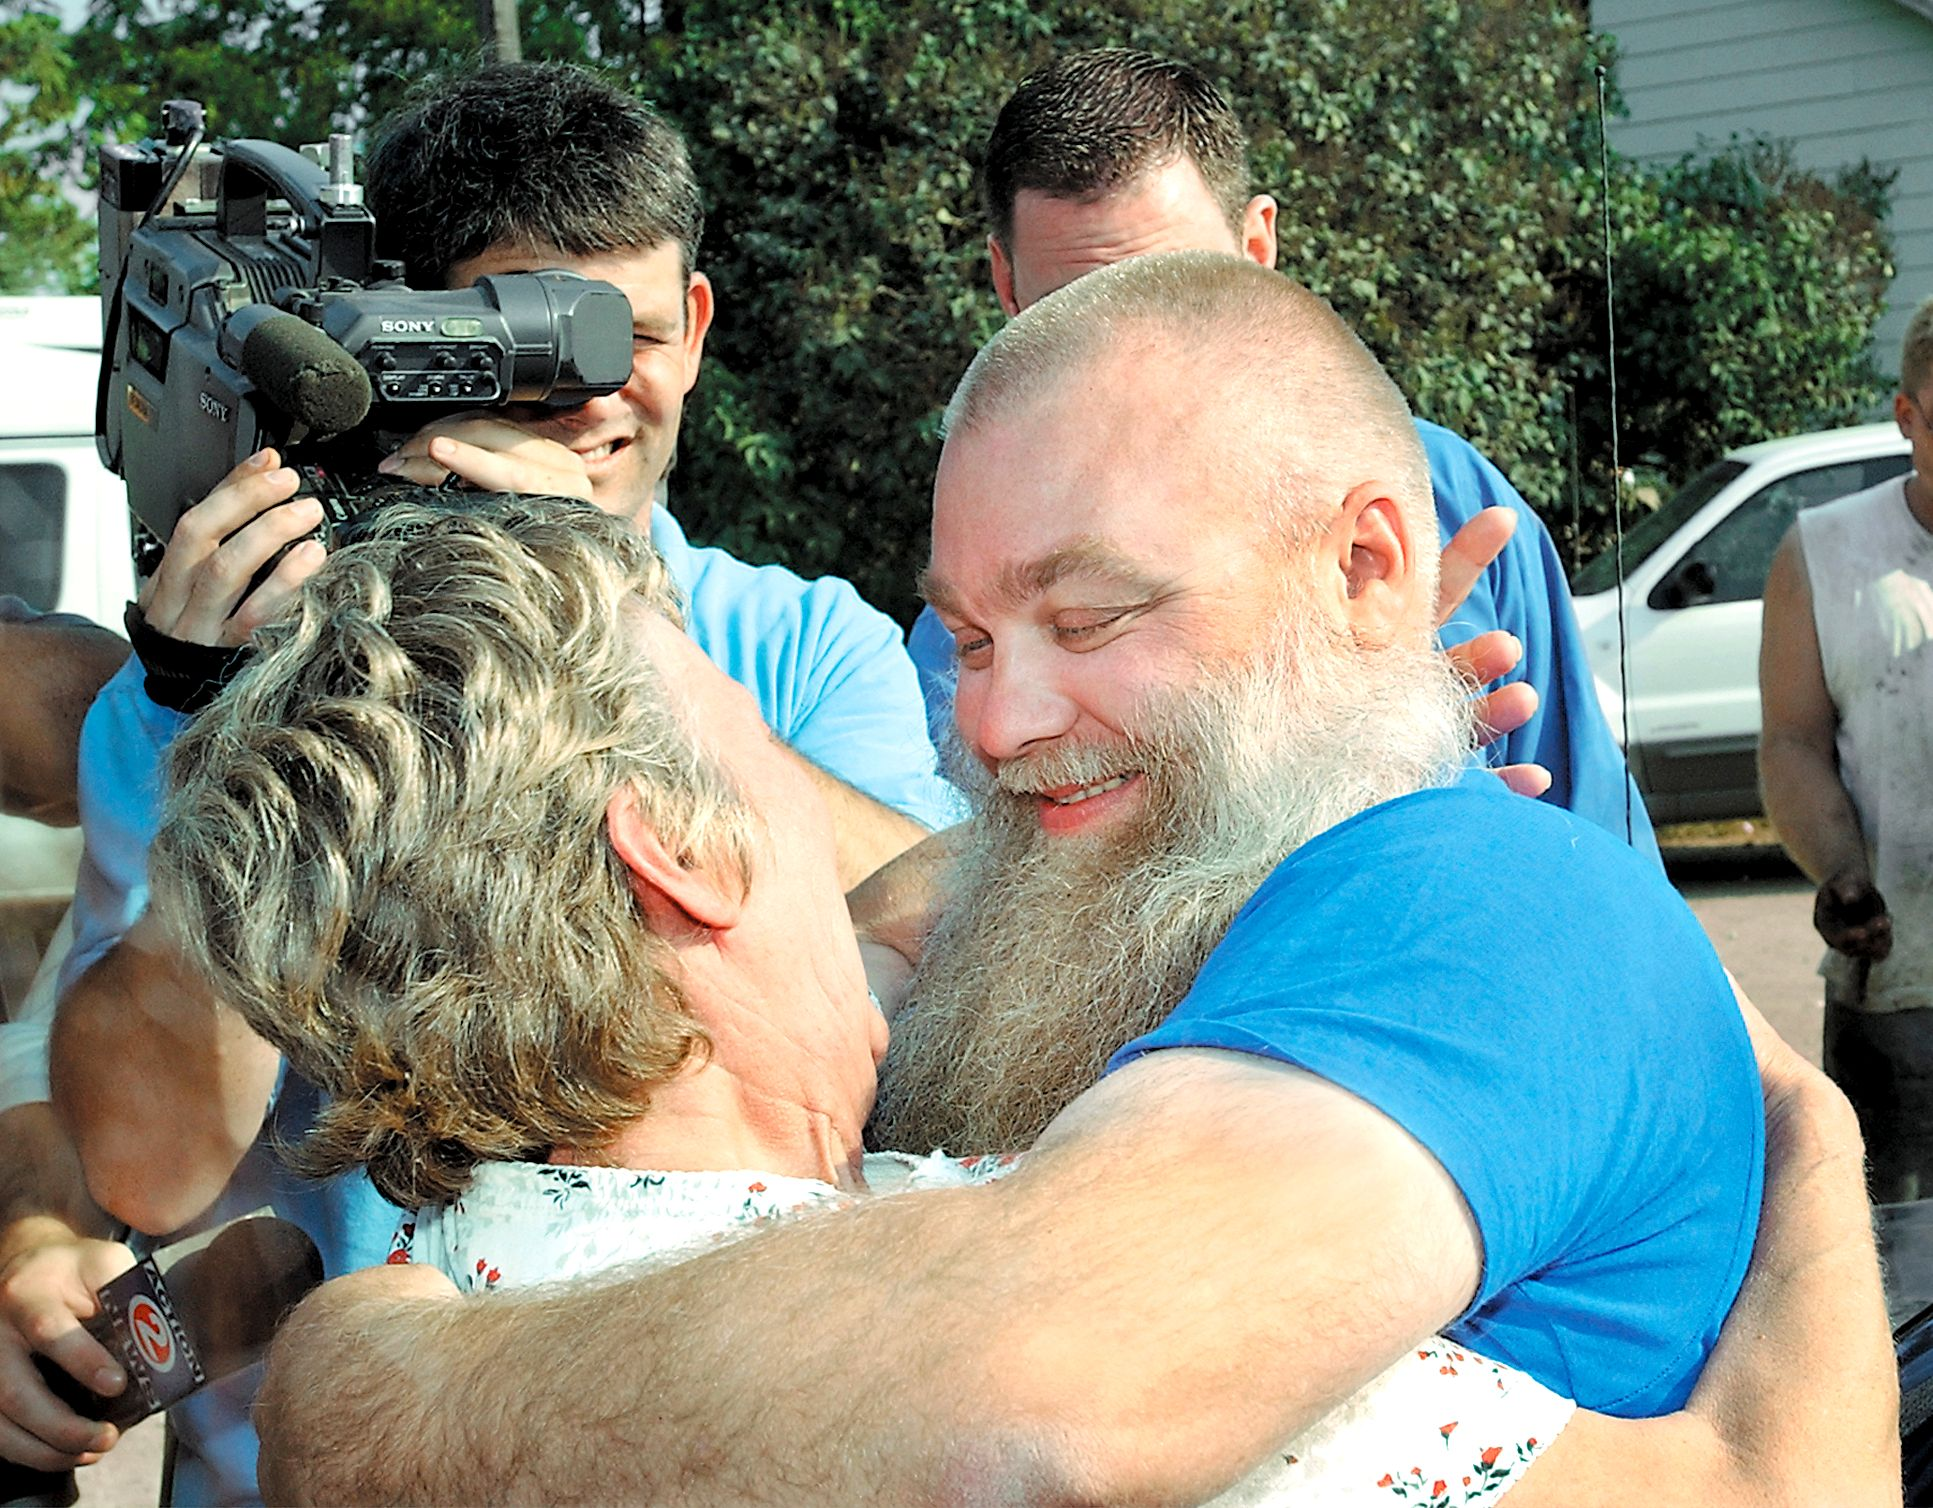 Stephen avery released